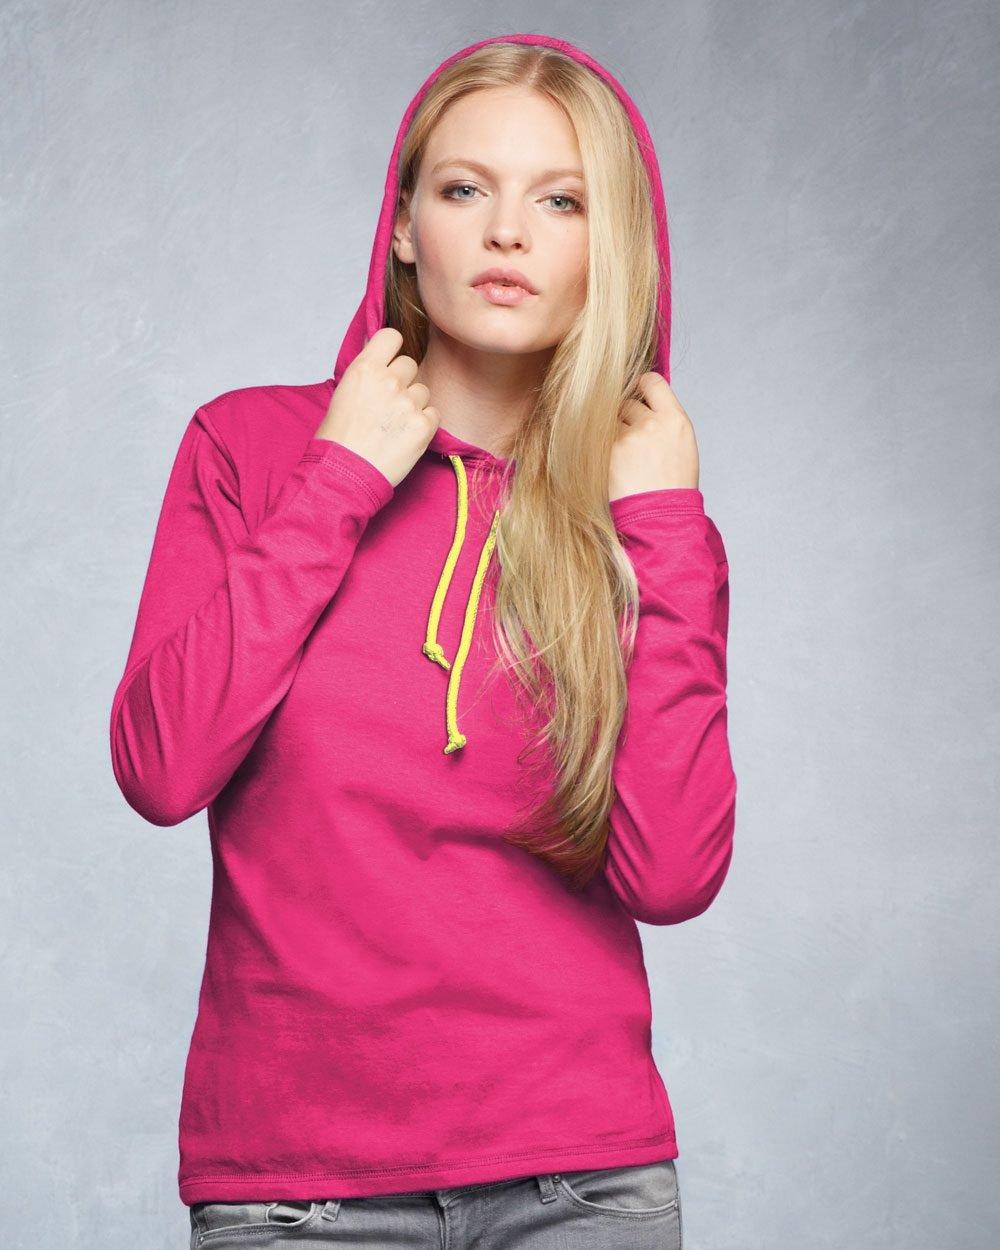 b62375d31992 Anvil Ladies' Ringspun Long-Sleeve Hooded T-Shirt 887L - Evan ...